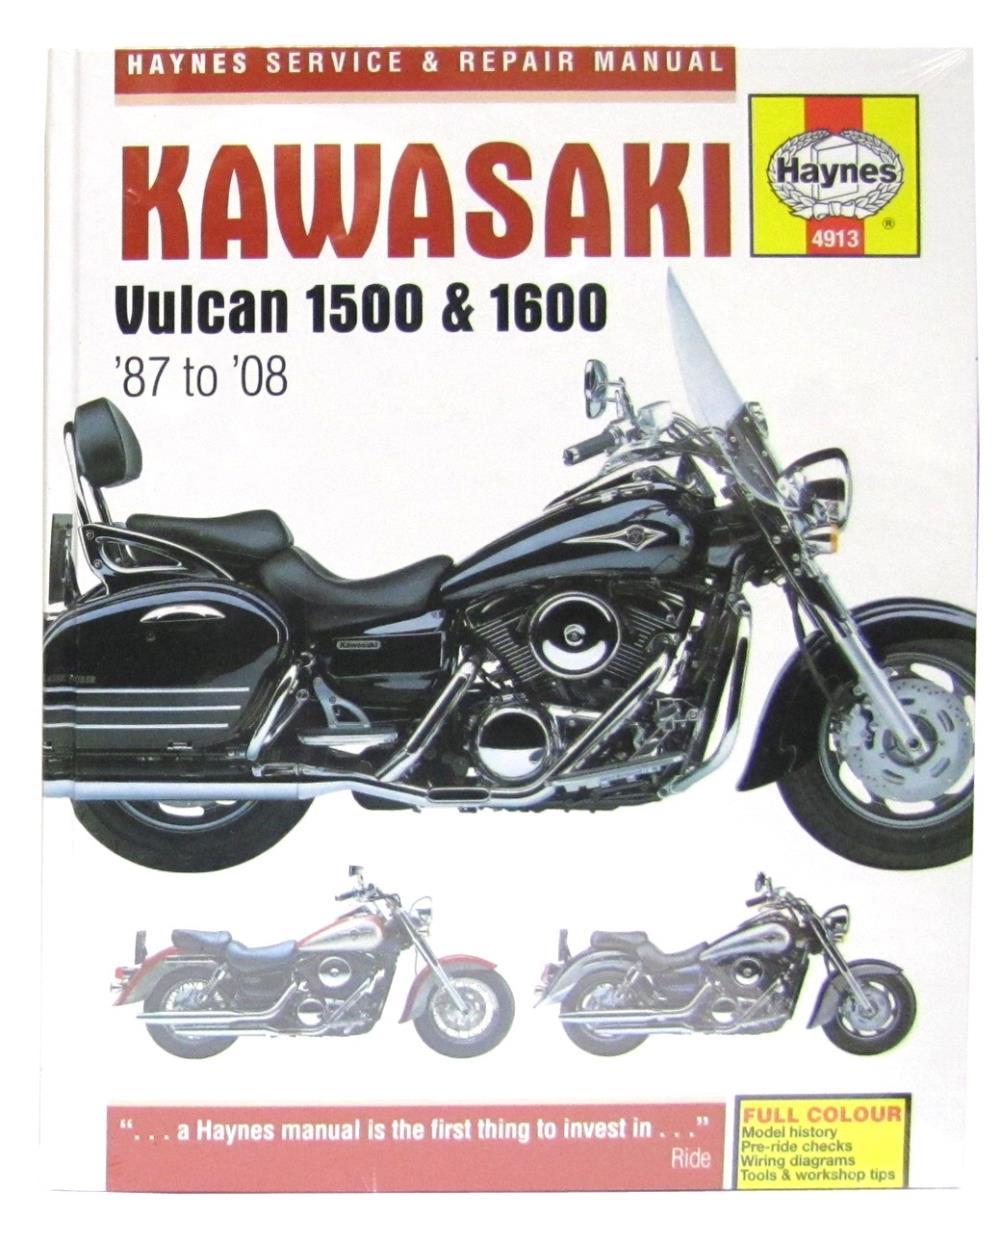 1995 Kawasaki Vulcan 1500 Wiring Diagram Free Download Electrical 185 Schematic Blueprint For A 1992 Atv